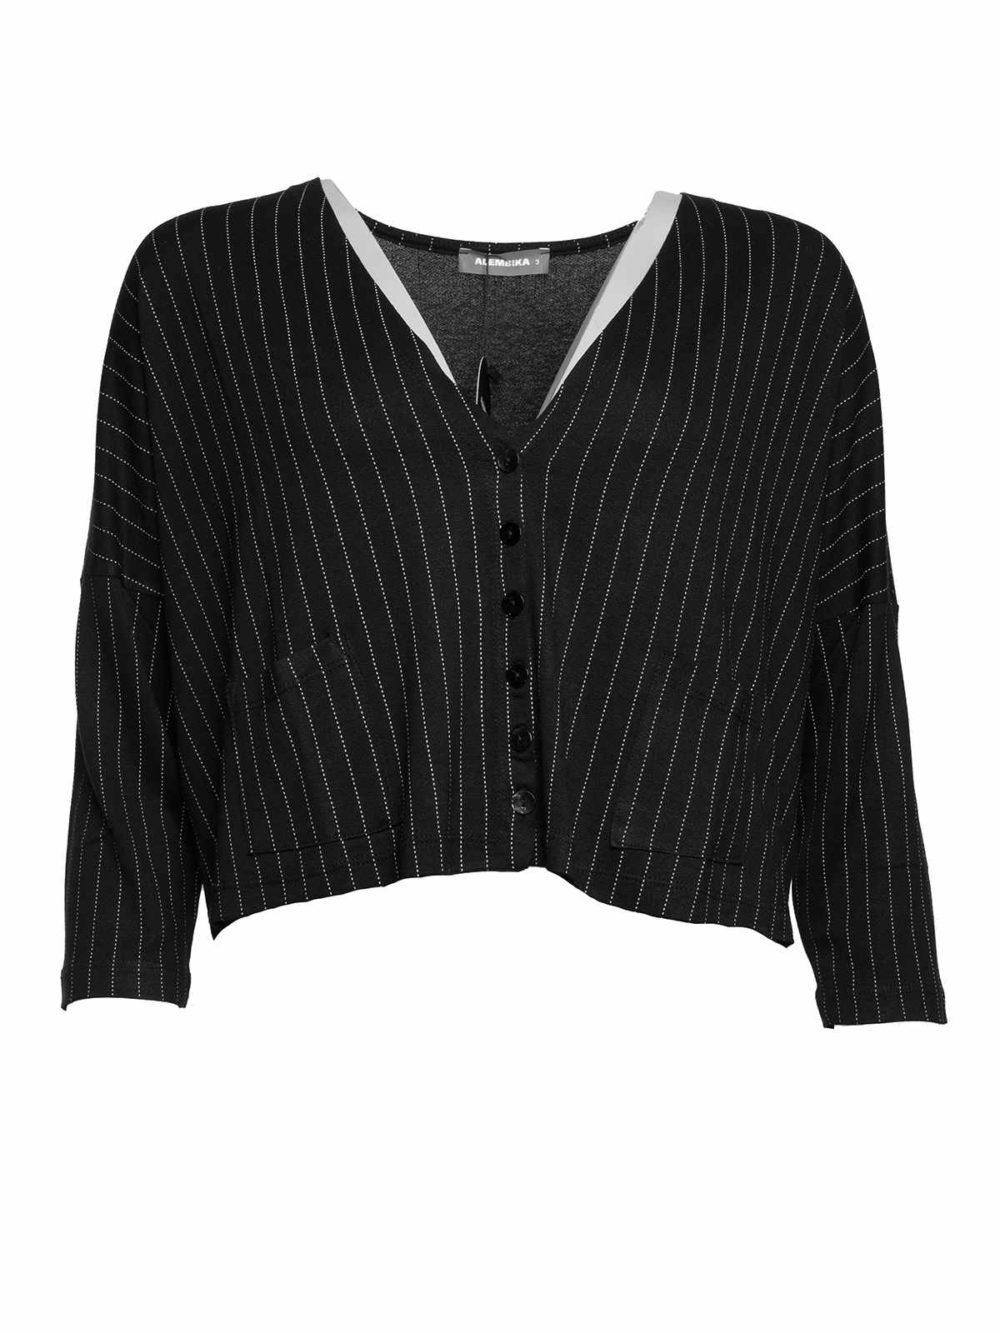 SJ310P Jacket Alembika Katie Kerr Women's Clothing